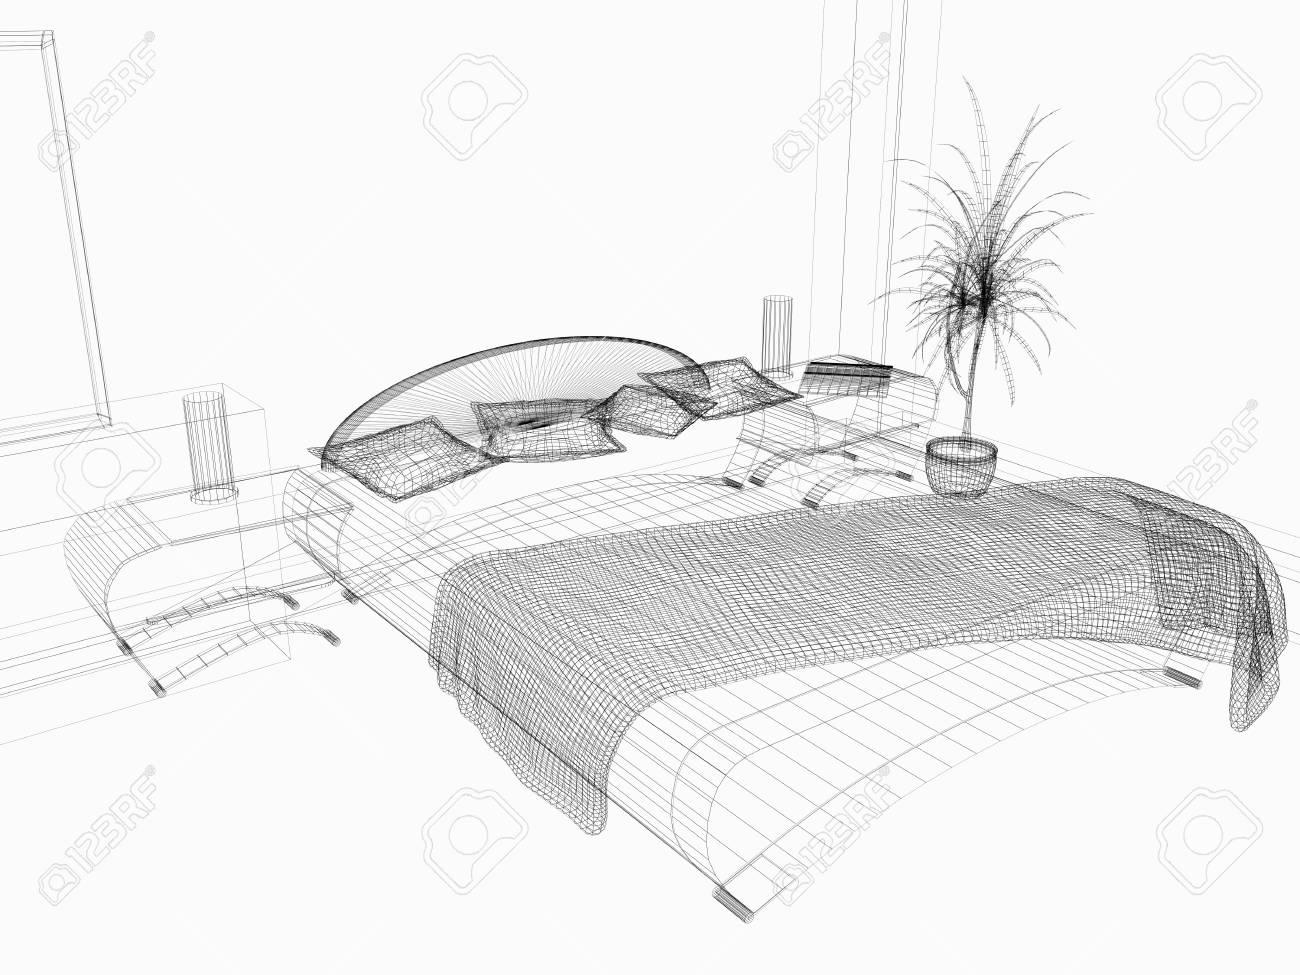 Bedroom in modern style 3d rendering Stock Photo - 9325434